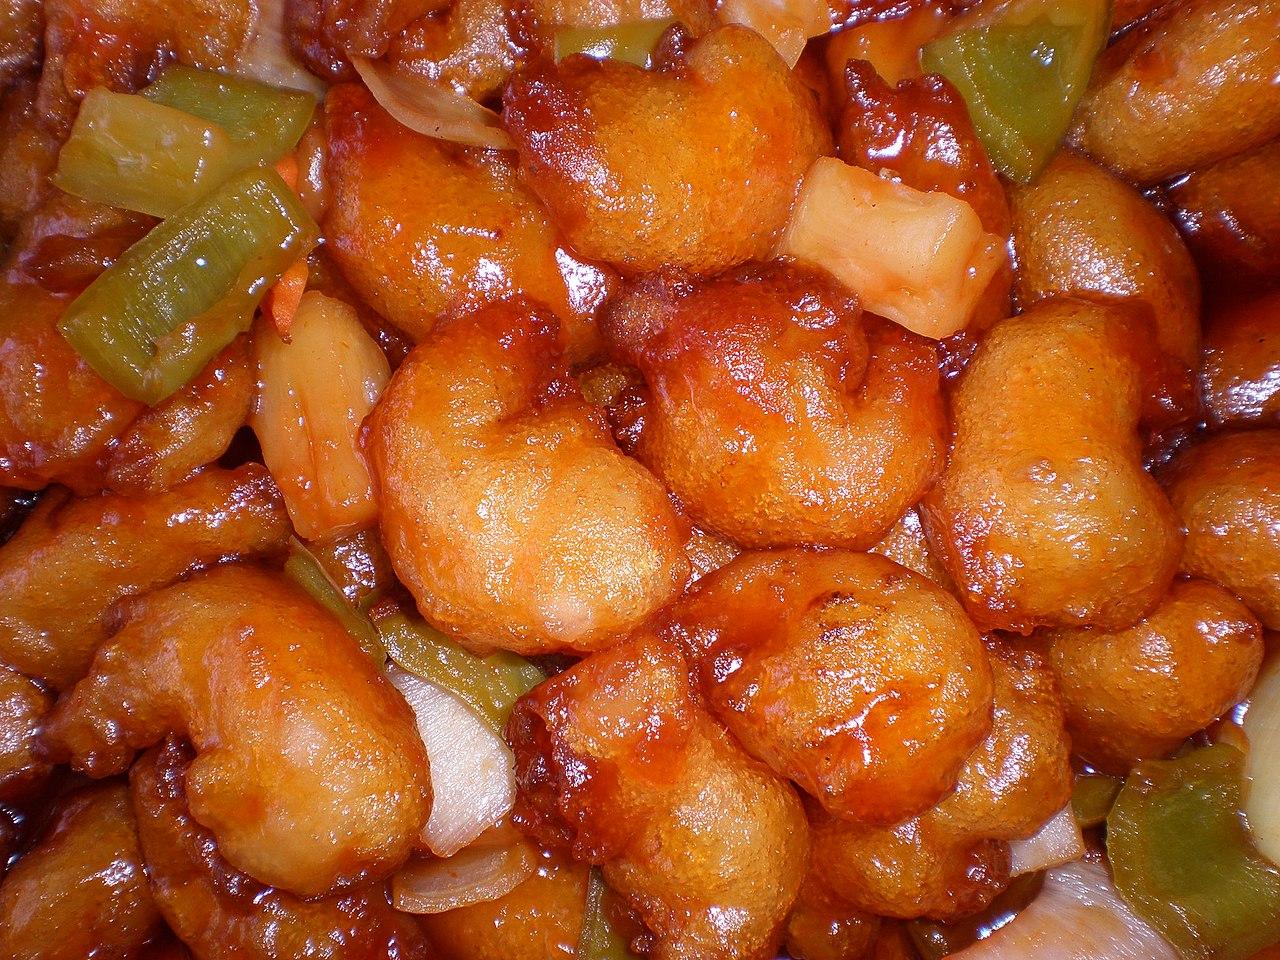 File:Honey-glazed prawns 3.JPG - Wikimedia Commons